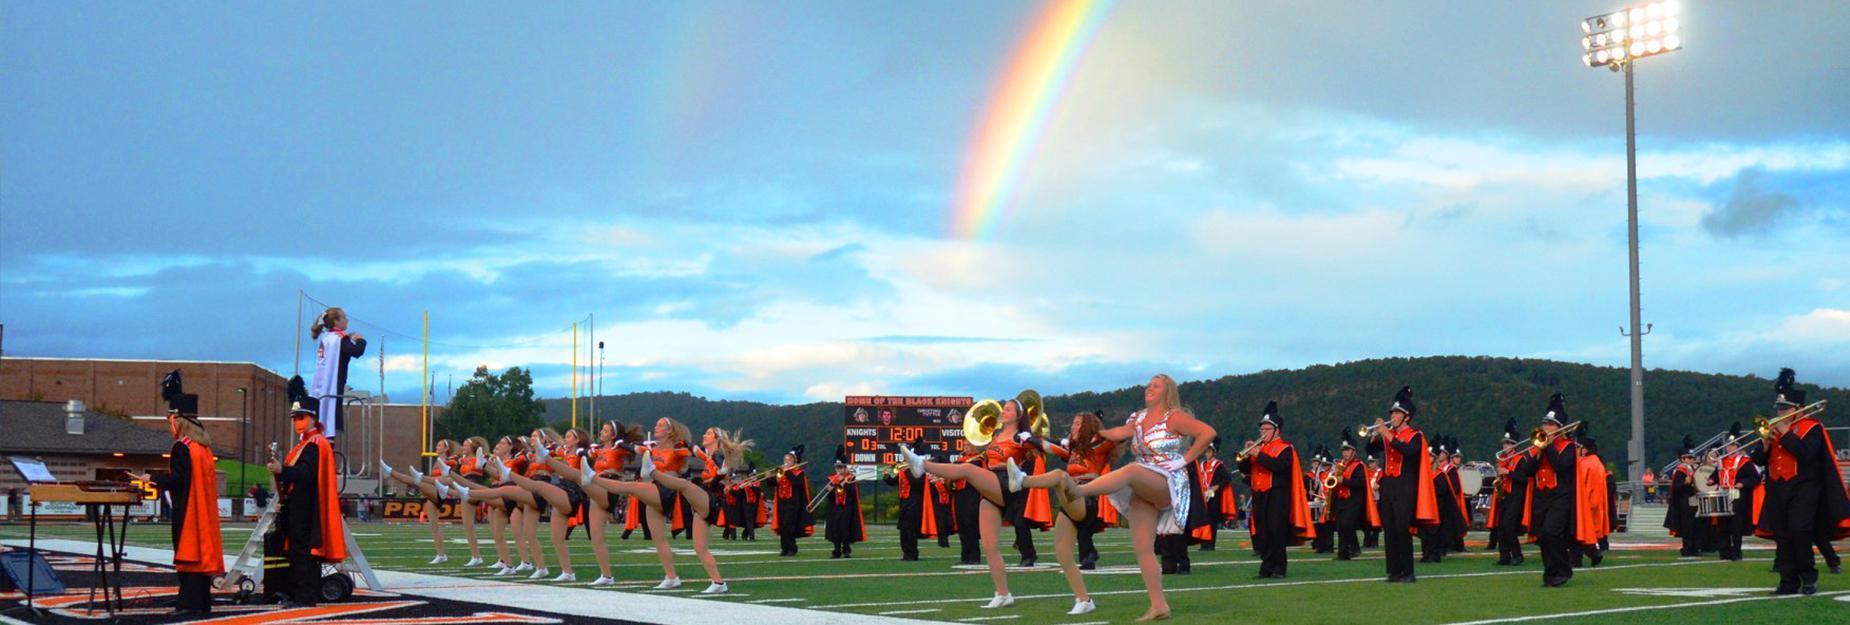 Band Rainbow